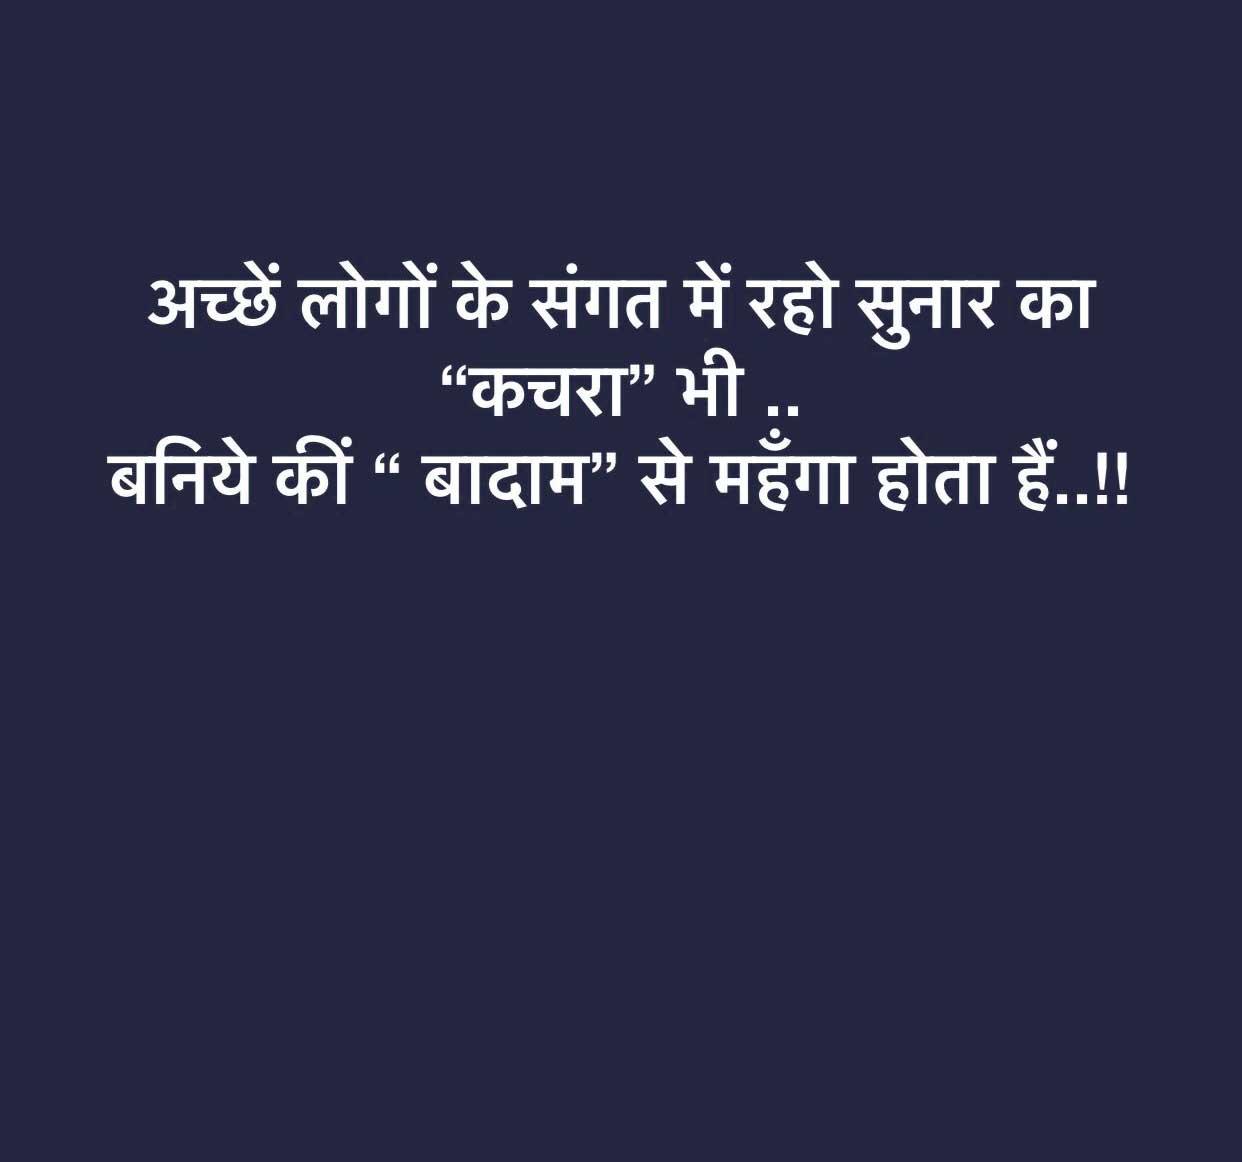 Hindi Love Whatsapp DP Photo Hd Free